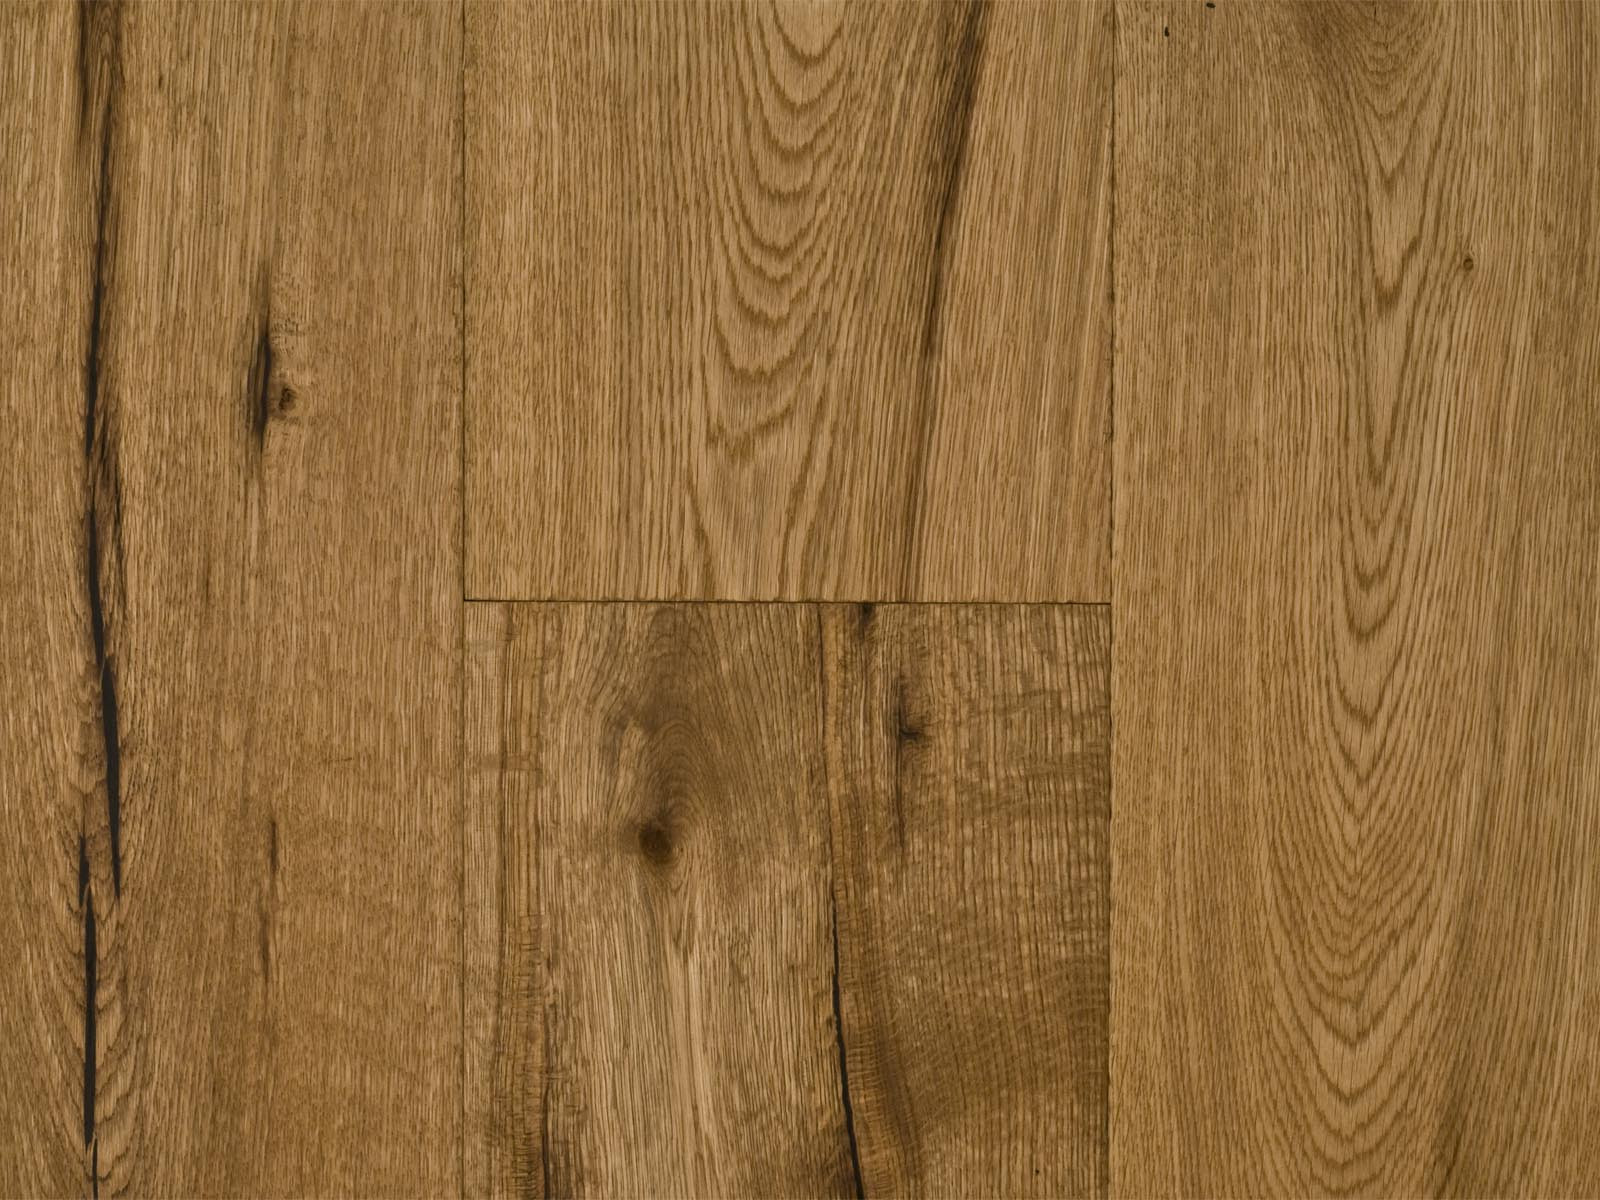 hardwood floor finishes review of duchateau hardwood flooring houston tx discount engineered wood pertaining to natural european oak